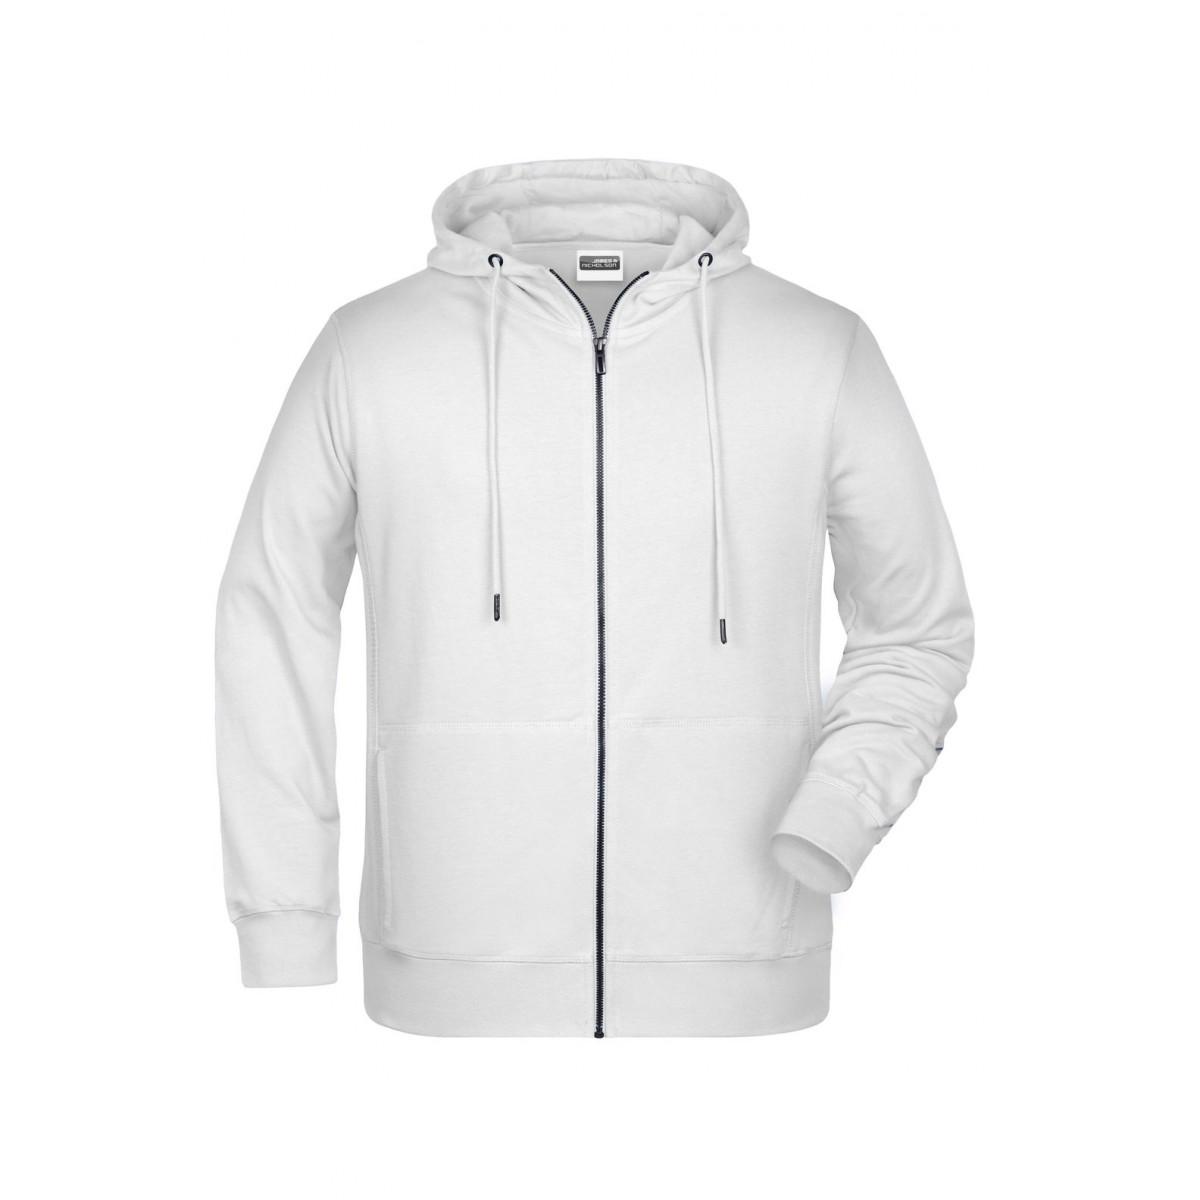 Толстовка мужская 8026 Mens Zip Hoody - Белый